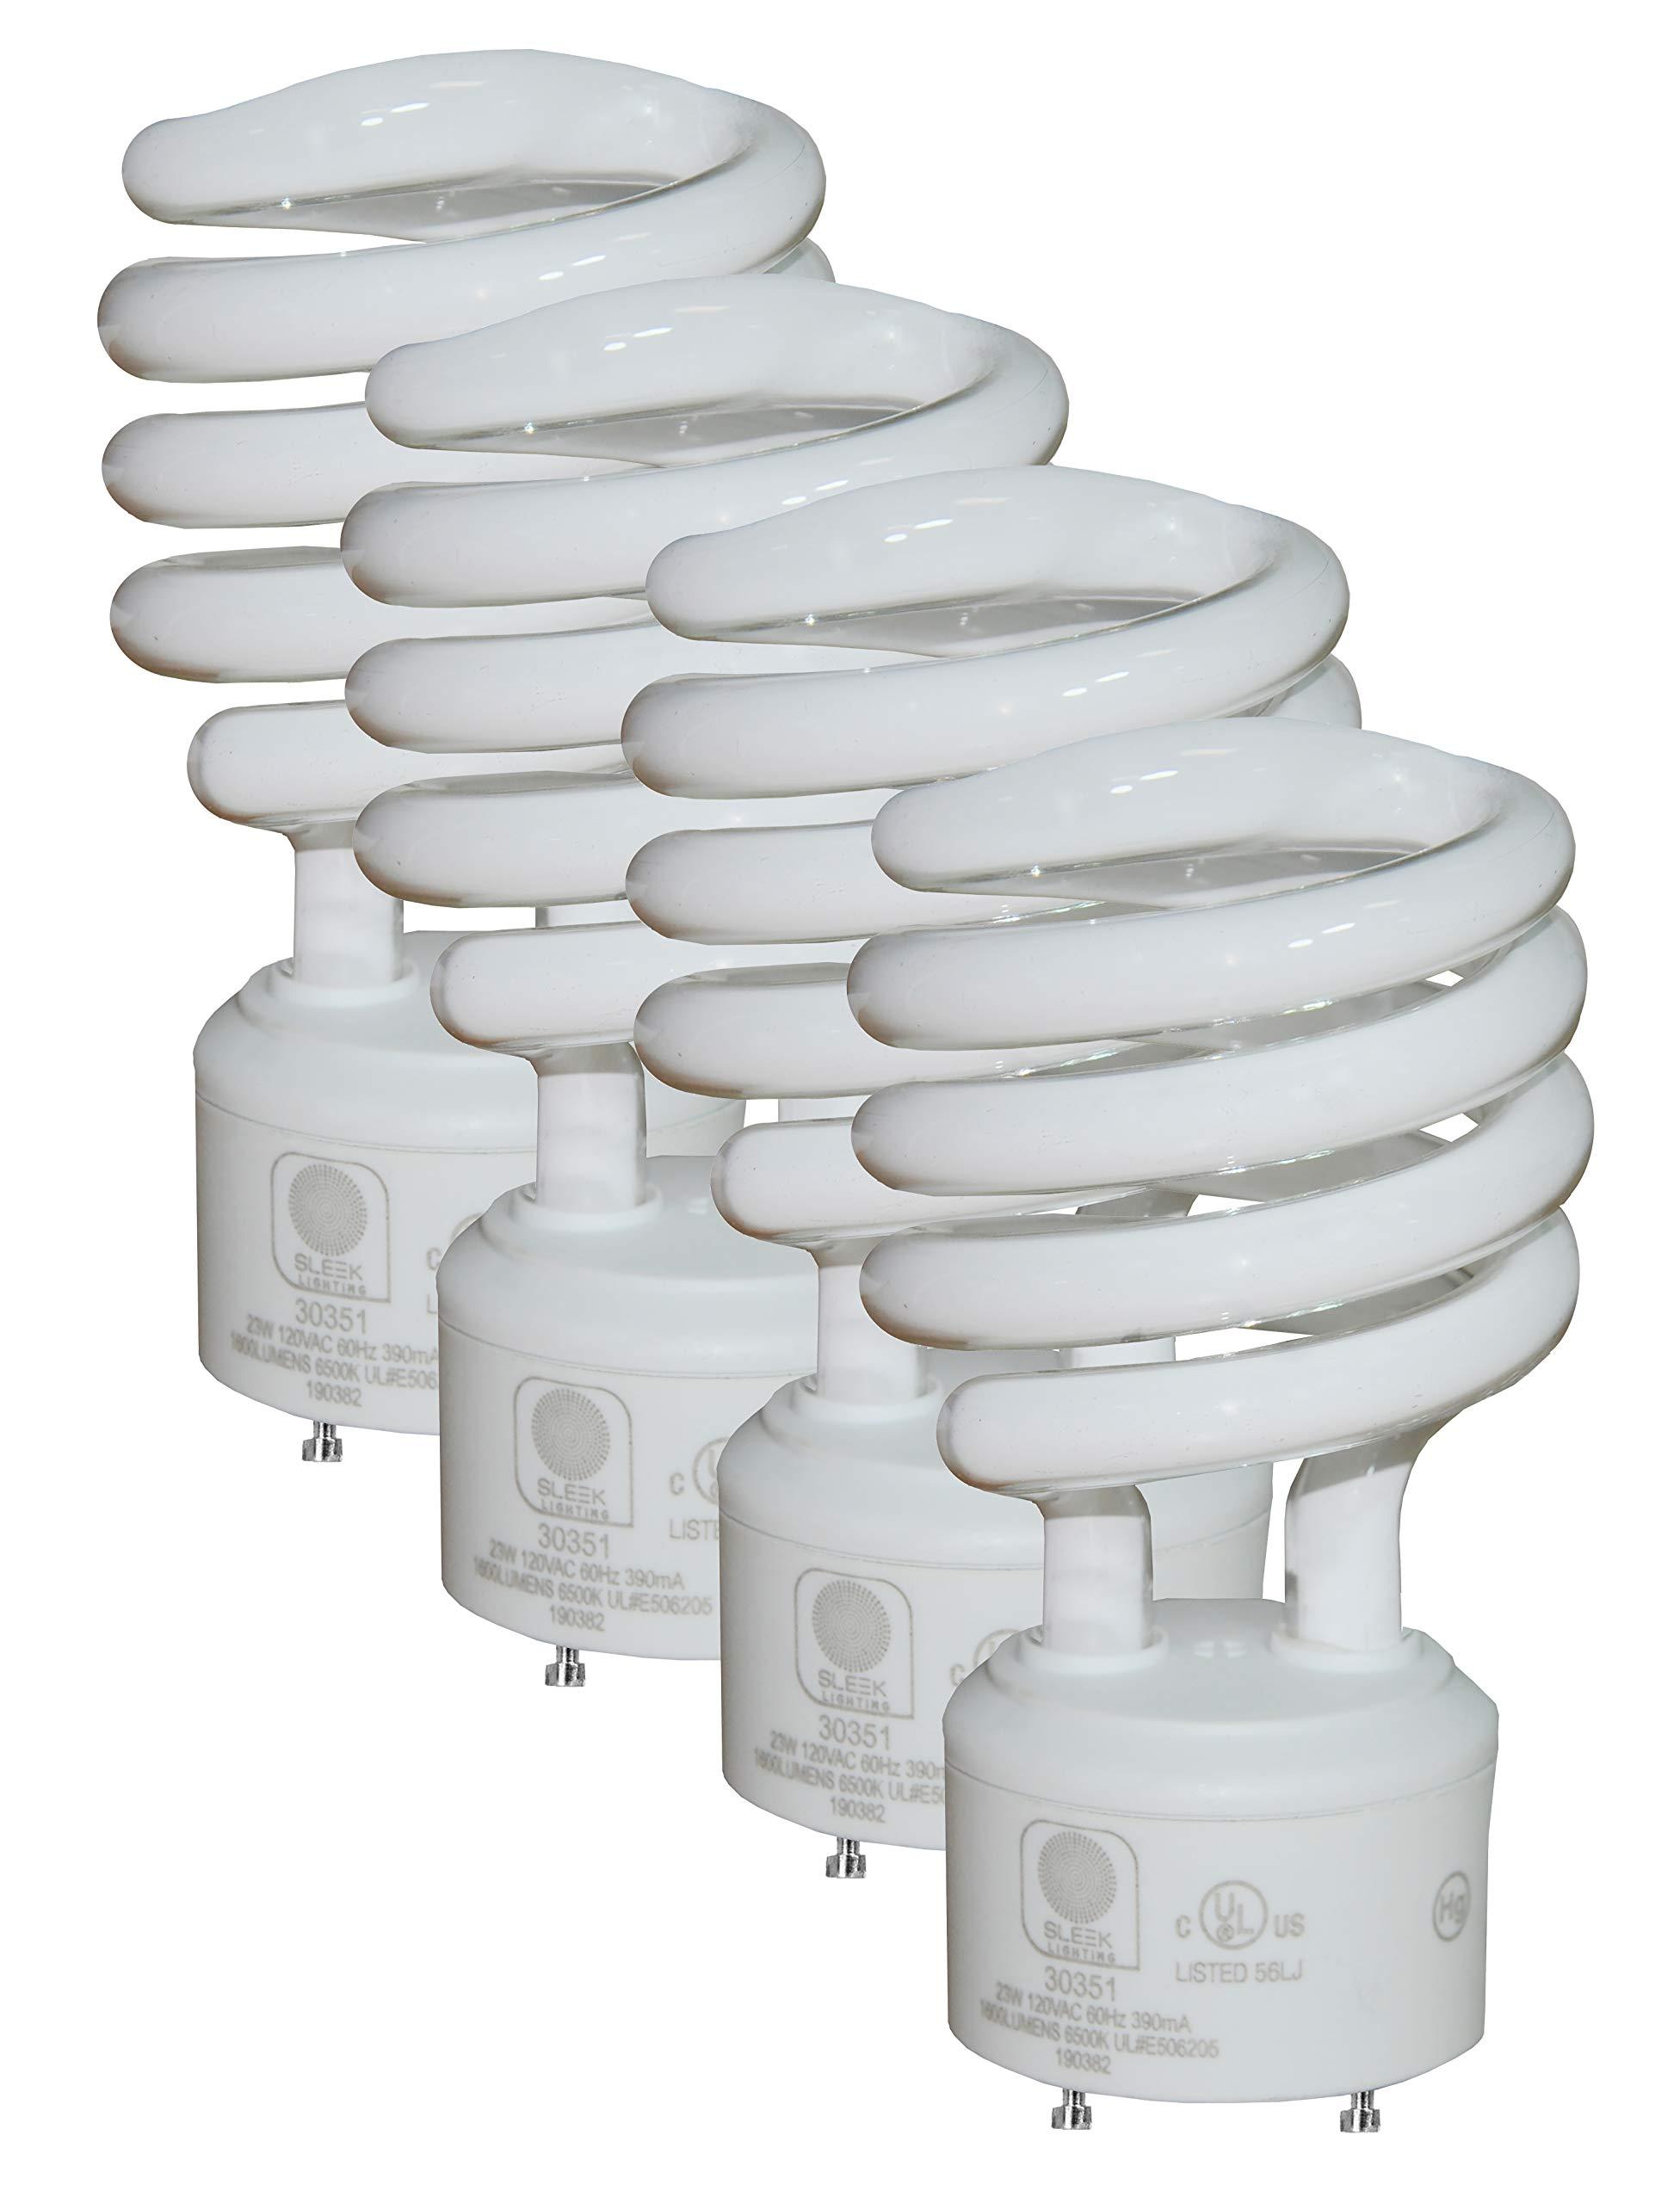 SleekLighting Gu24 23Watt UL Listed Light Bulb Two Prong Twist 2 Pin -T2 Spiral CFL 5000K 1600lm - 4pack